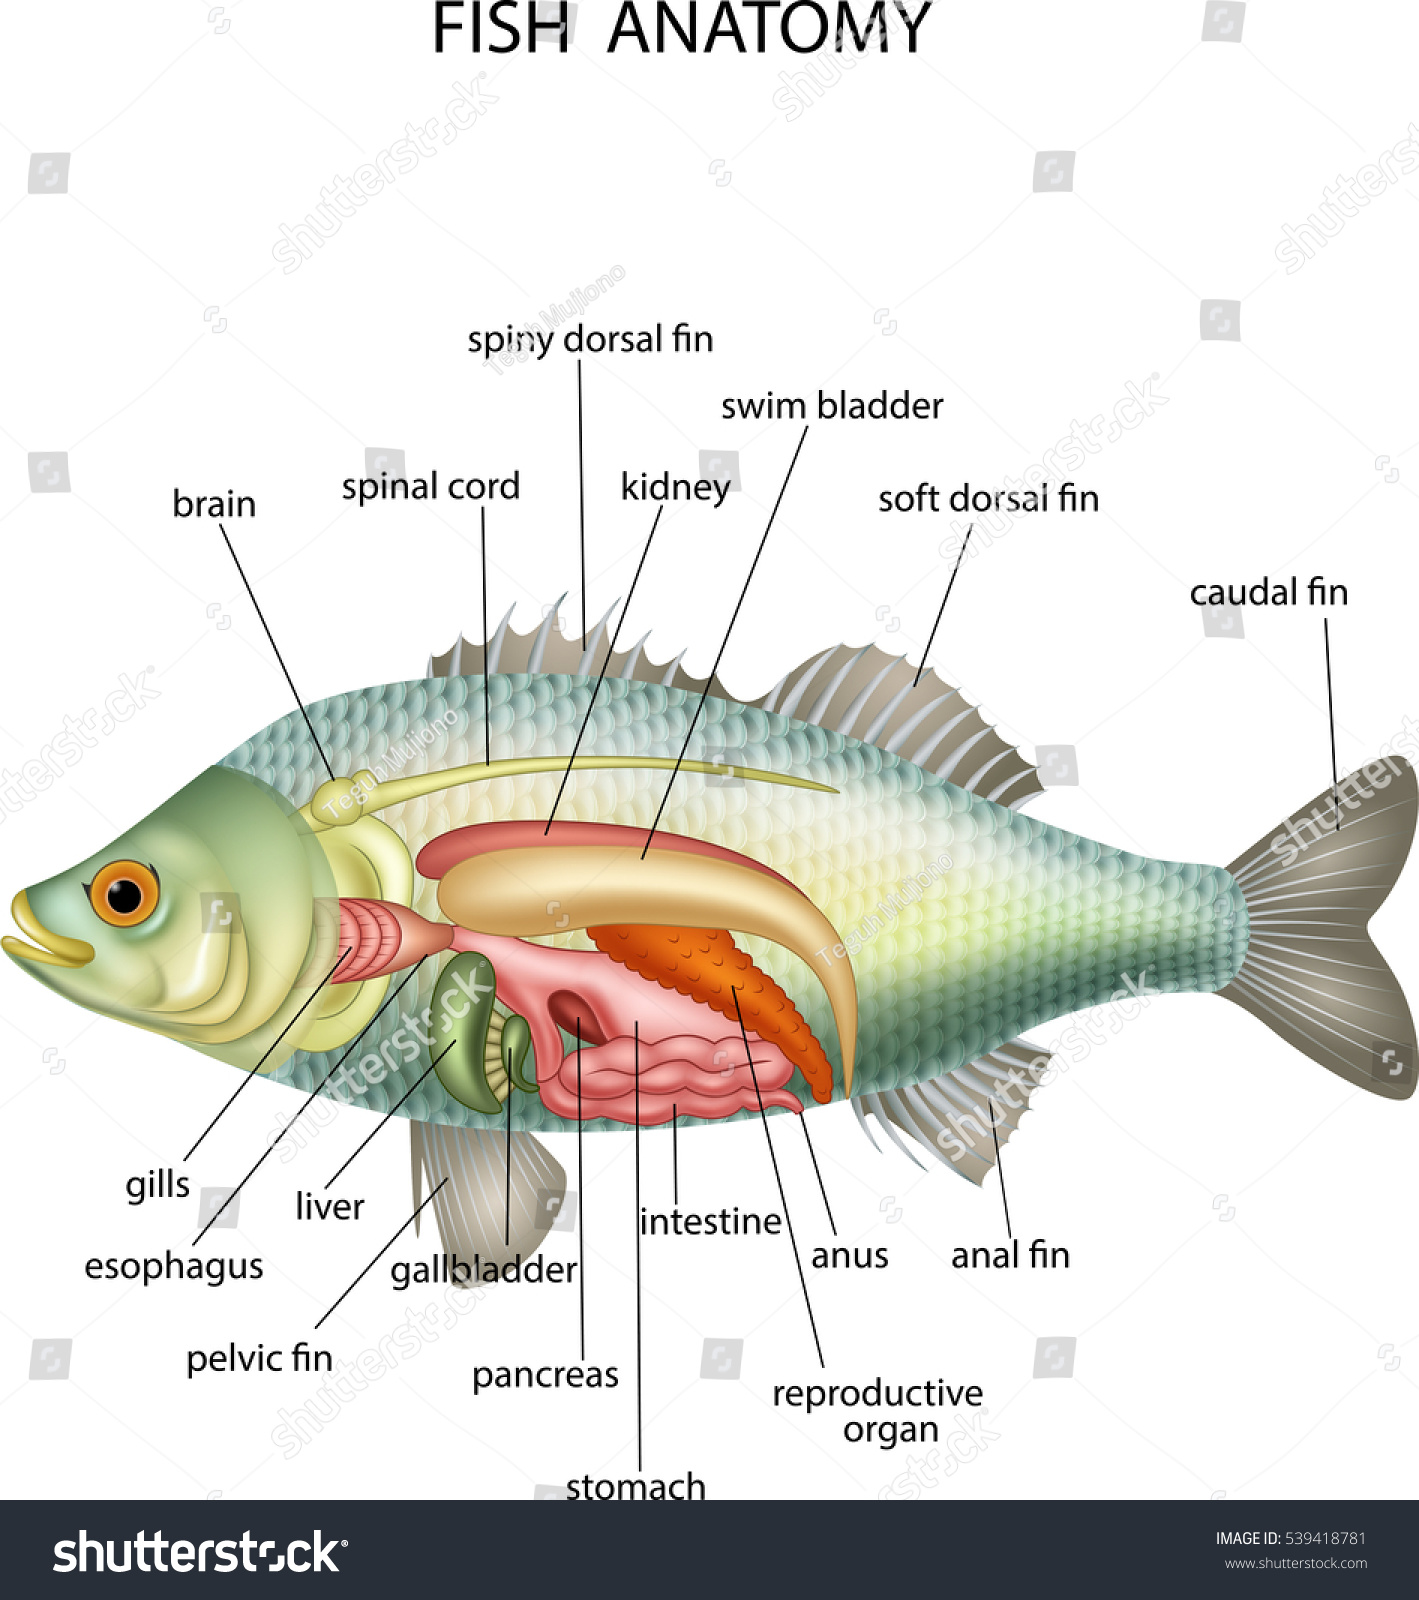 Worksheet Fish Anatomy Worksheet Grass Fedjp Worksheet